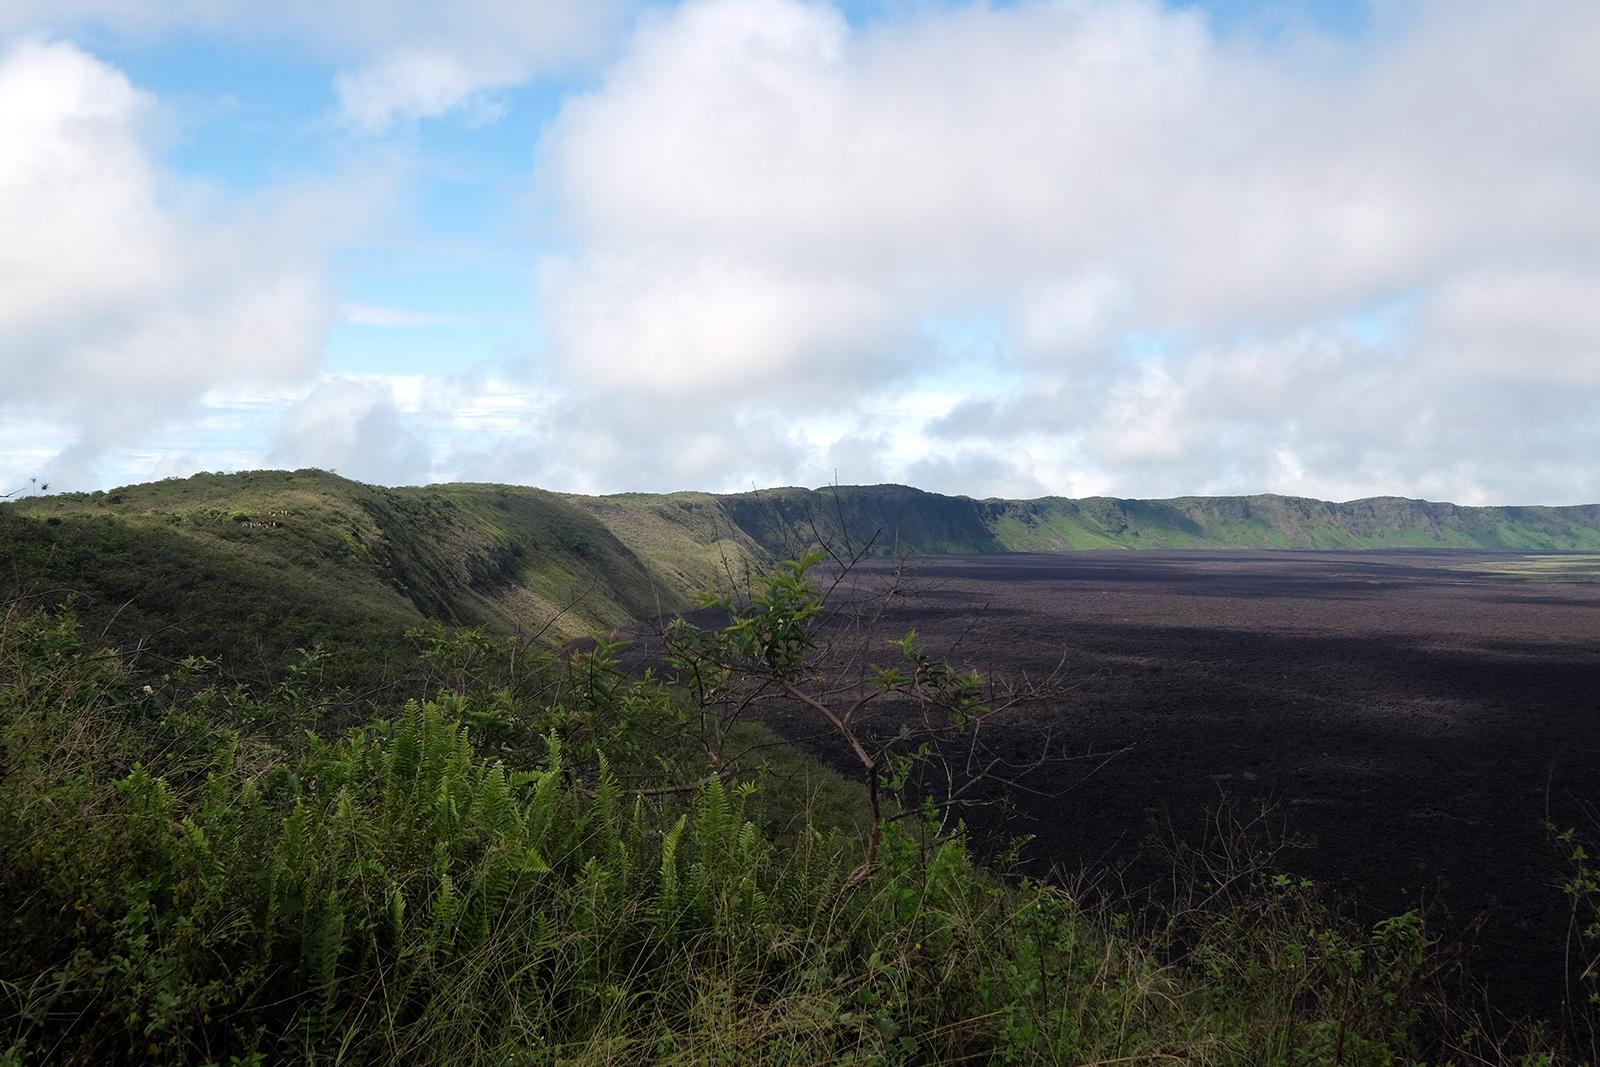 01_Volcan_Sierra_Negra_03_panorama.JPG